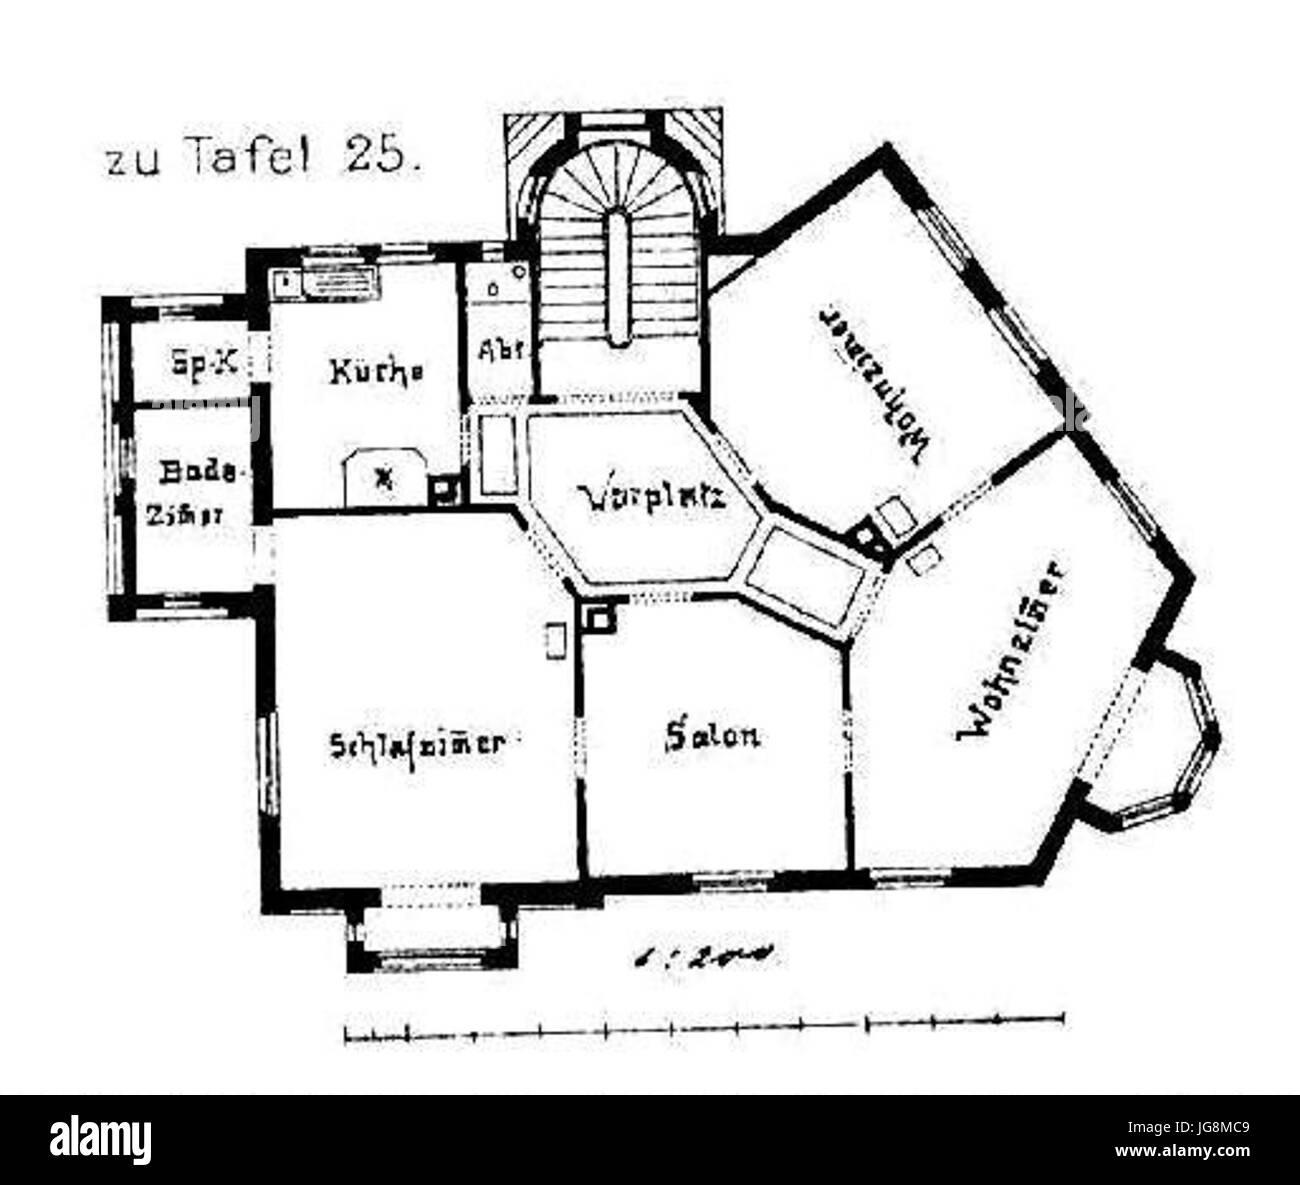 Architekt Ludwigsburg villa kallenberg ludwigsburg architekt albert bauder aus ludwigsburg